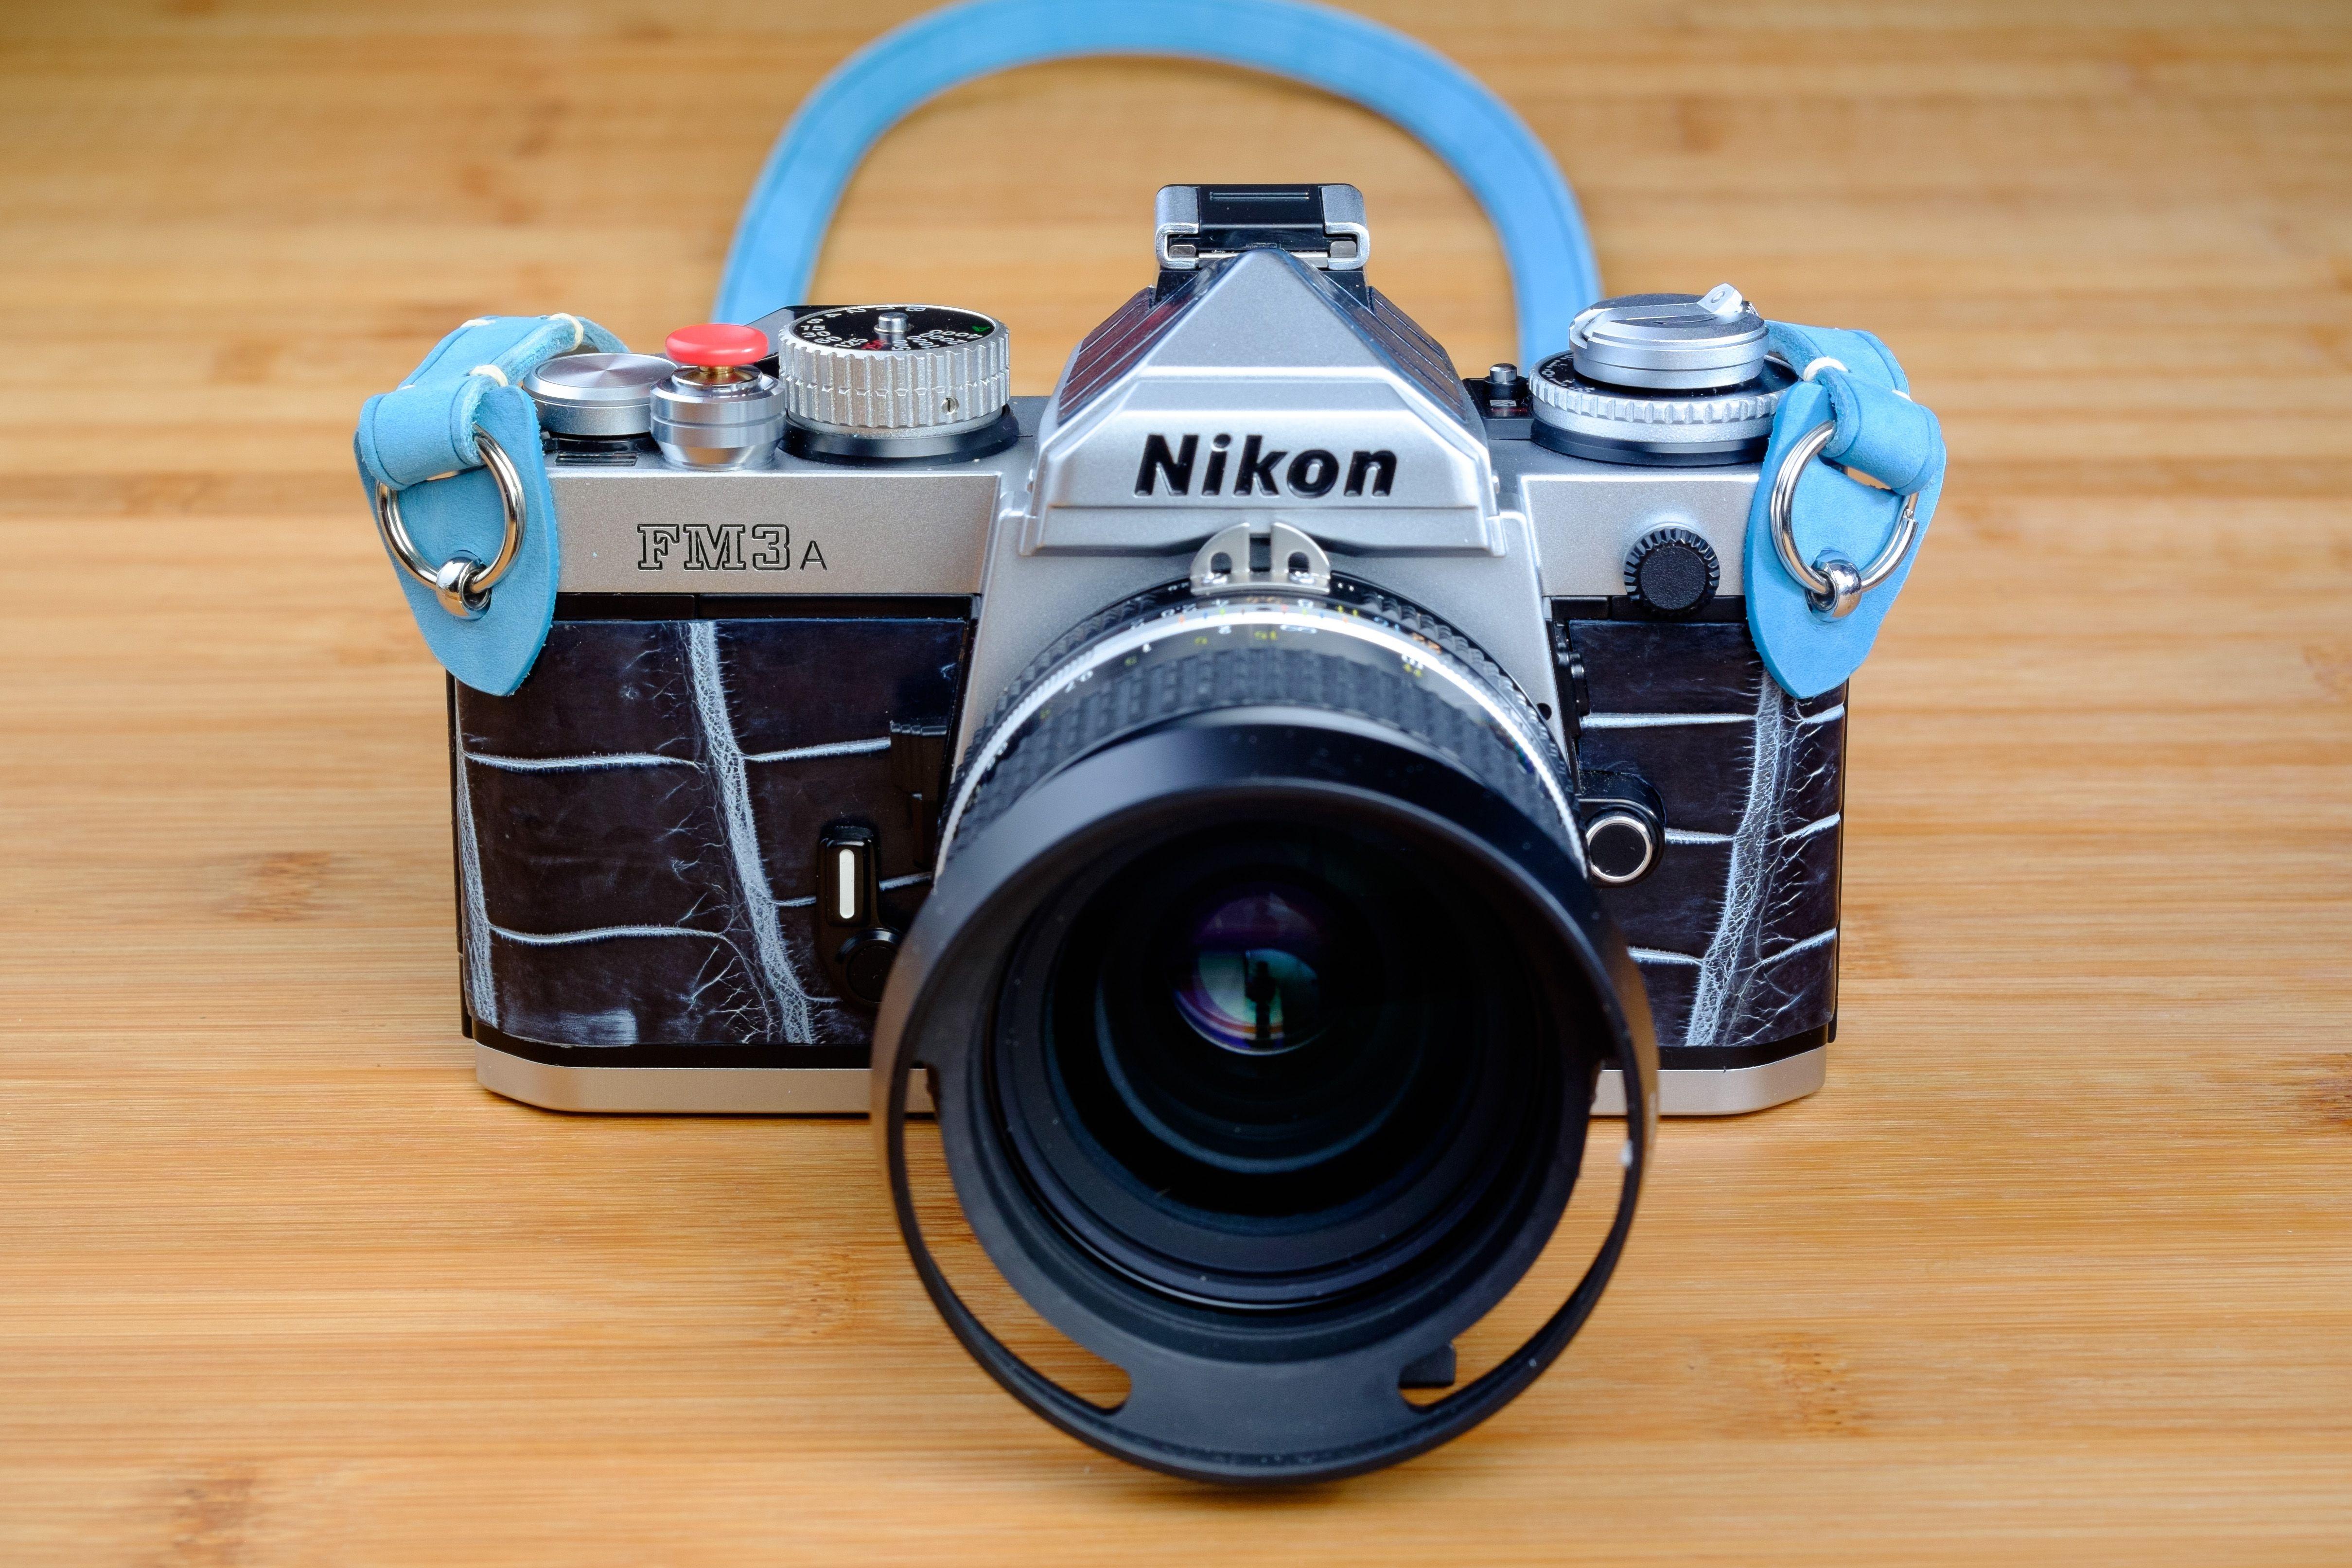 Nikon Fm3a Customized Blue Leather Strap And Genuine